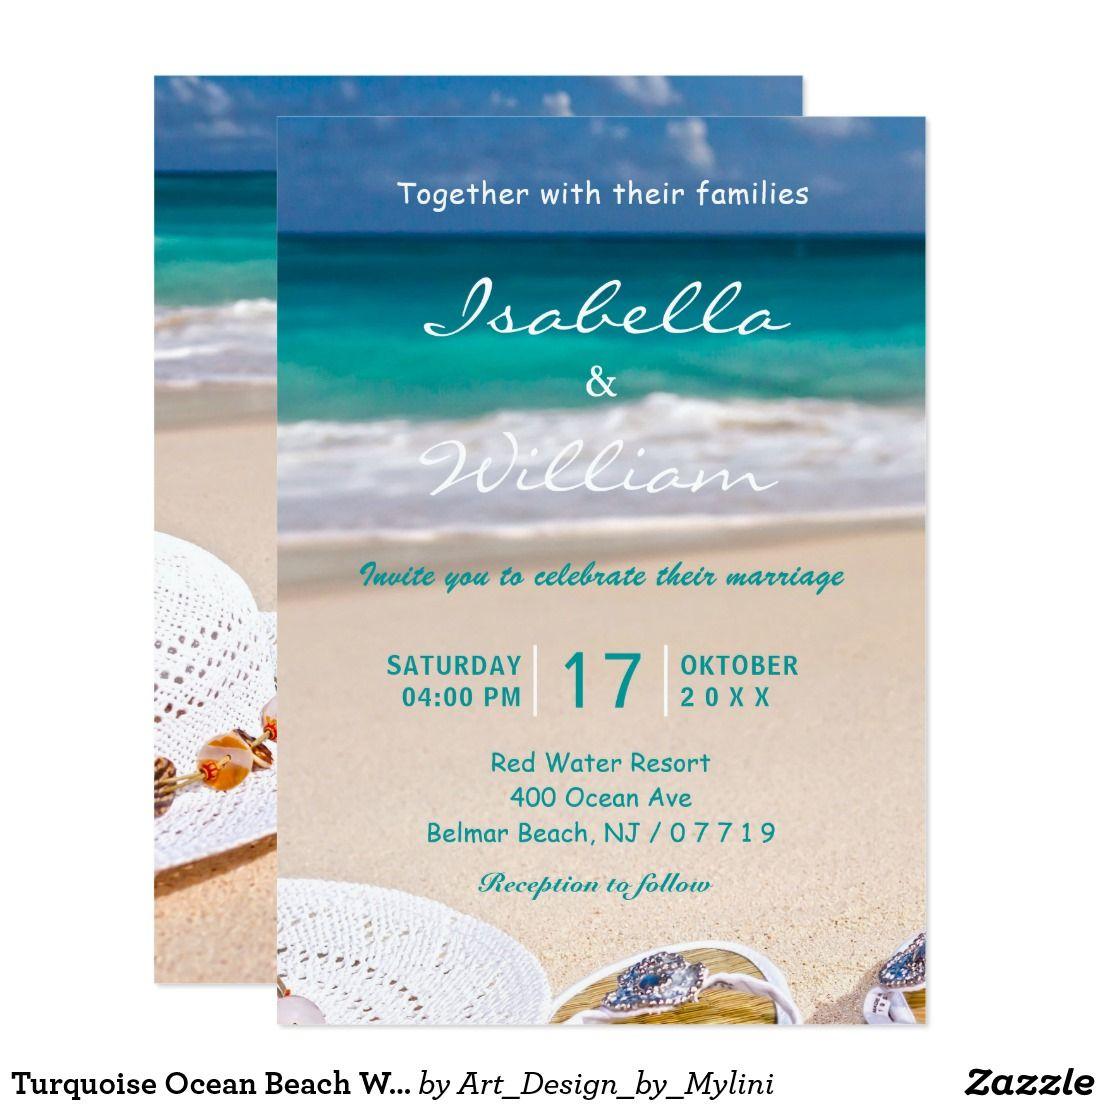 Turquoise Ocean Beach Wedding Invitation   Under the sea   Pinterest ...